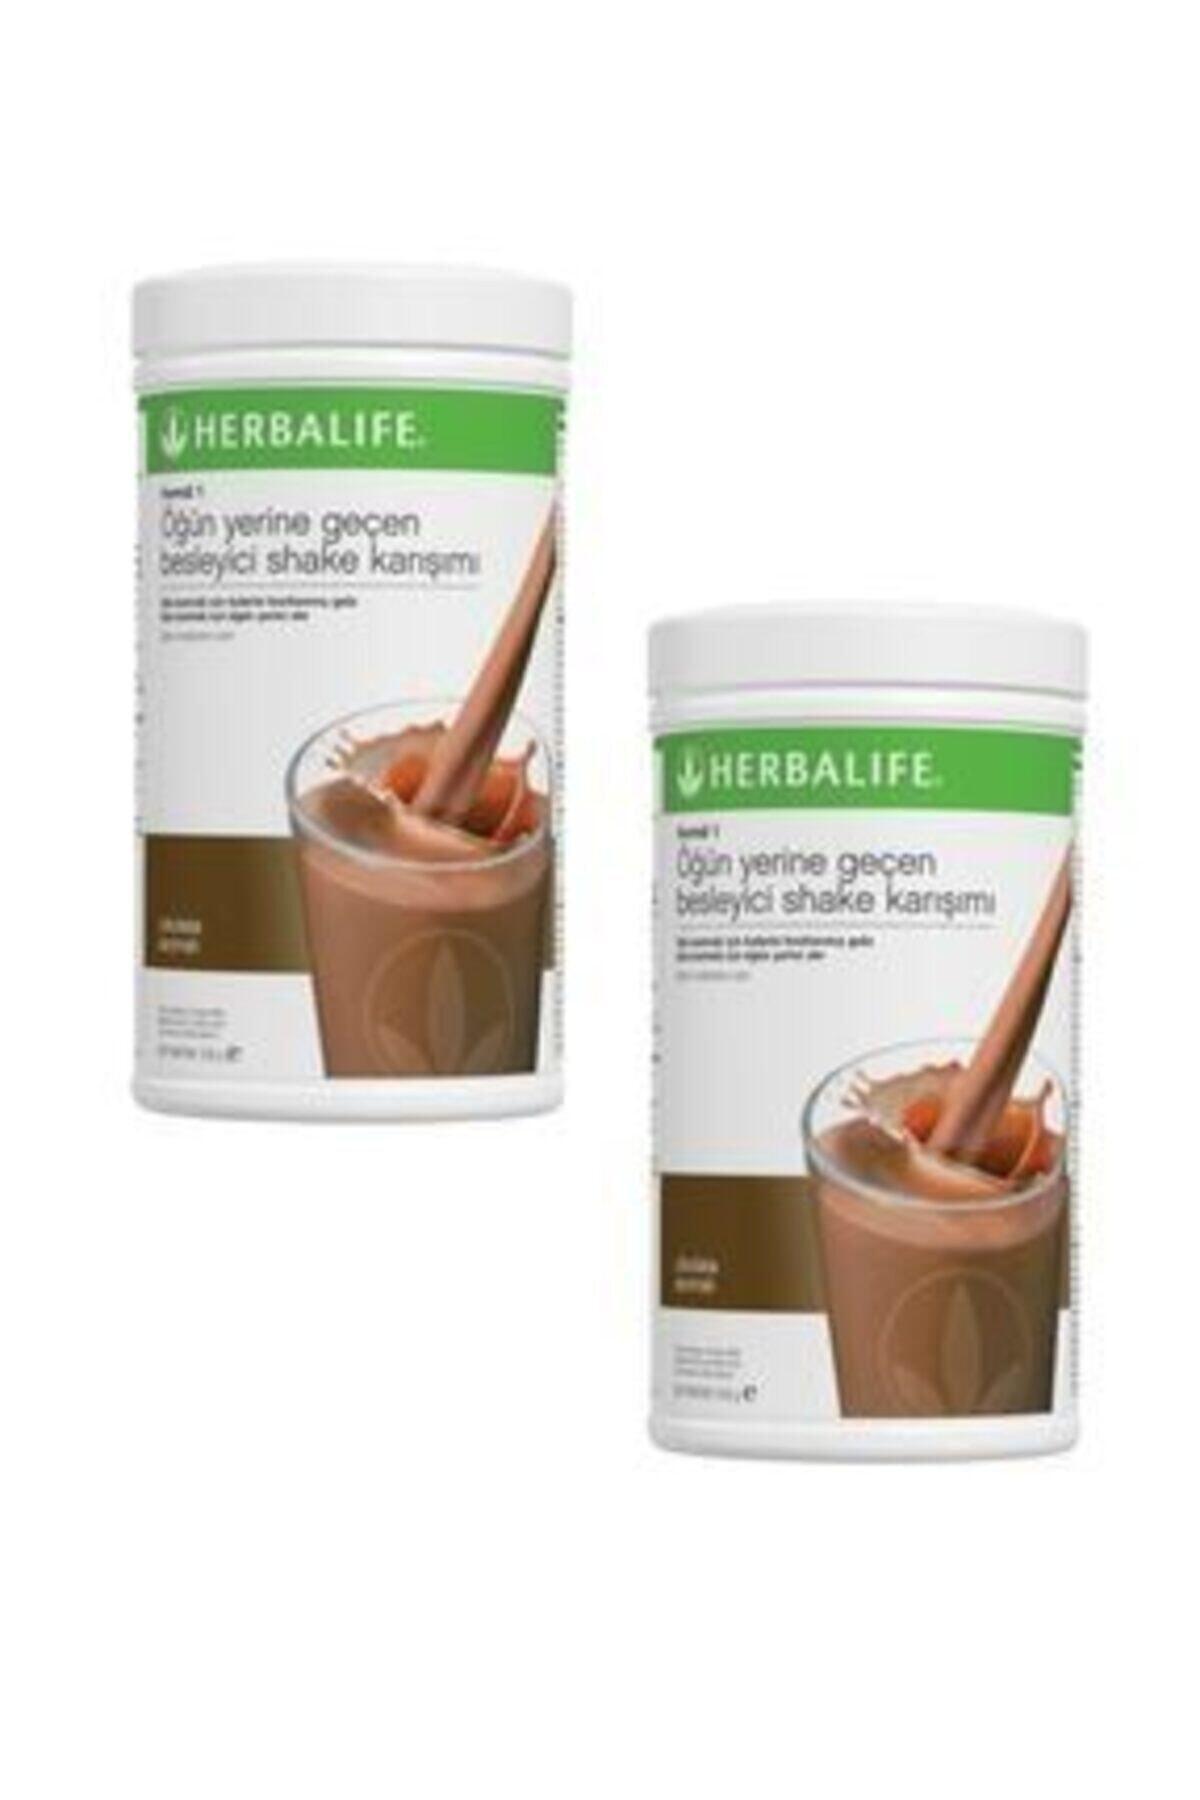 Herbalife Formül 1 Shake Karışım Seti 2 Adet Çikolata 550 gr 1